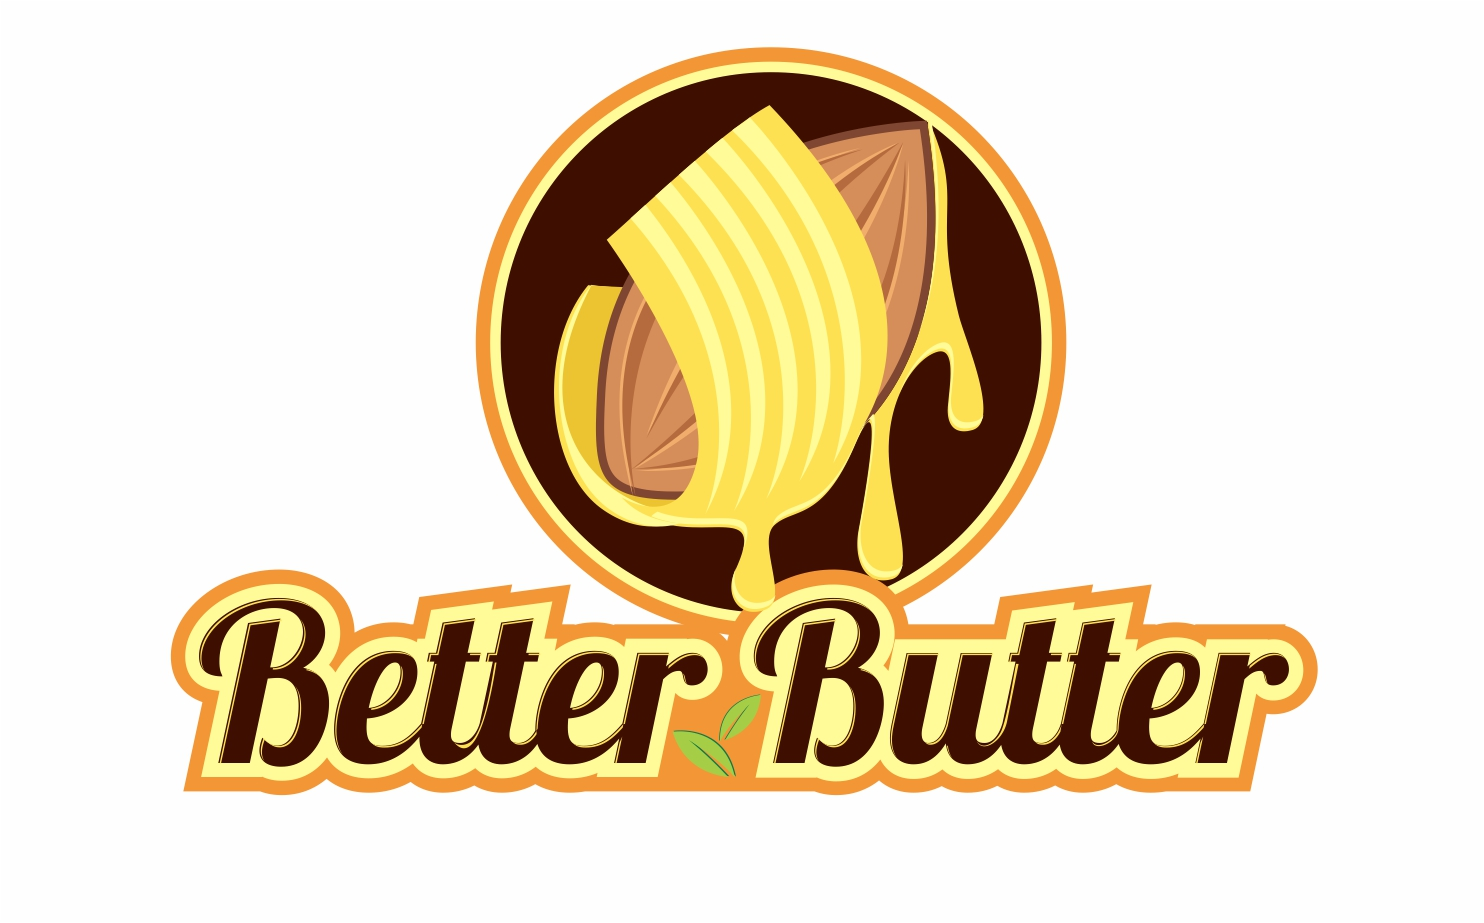 Elegant, Playful, Farm Logo Design for Better Butter by hih7.